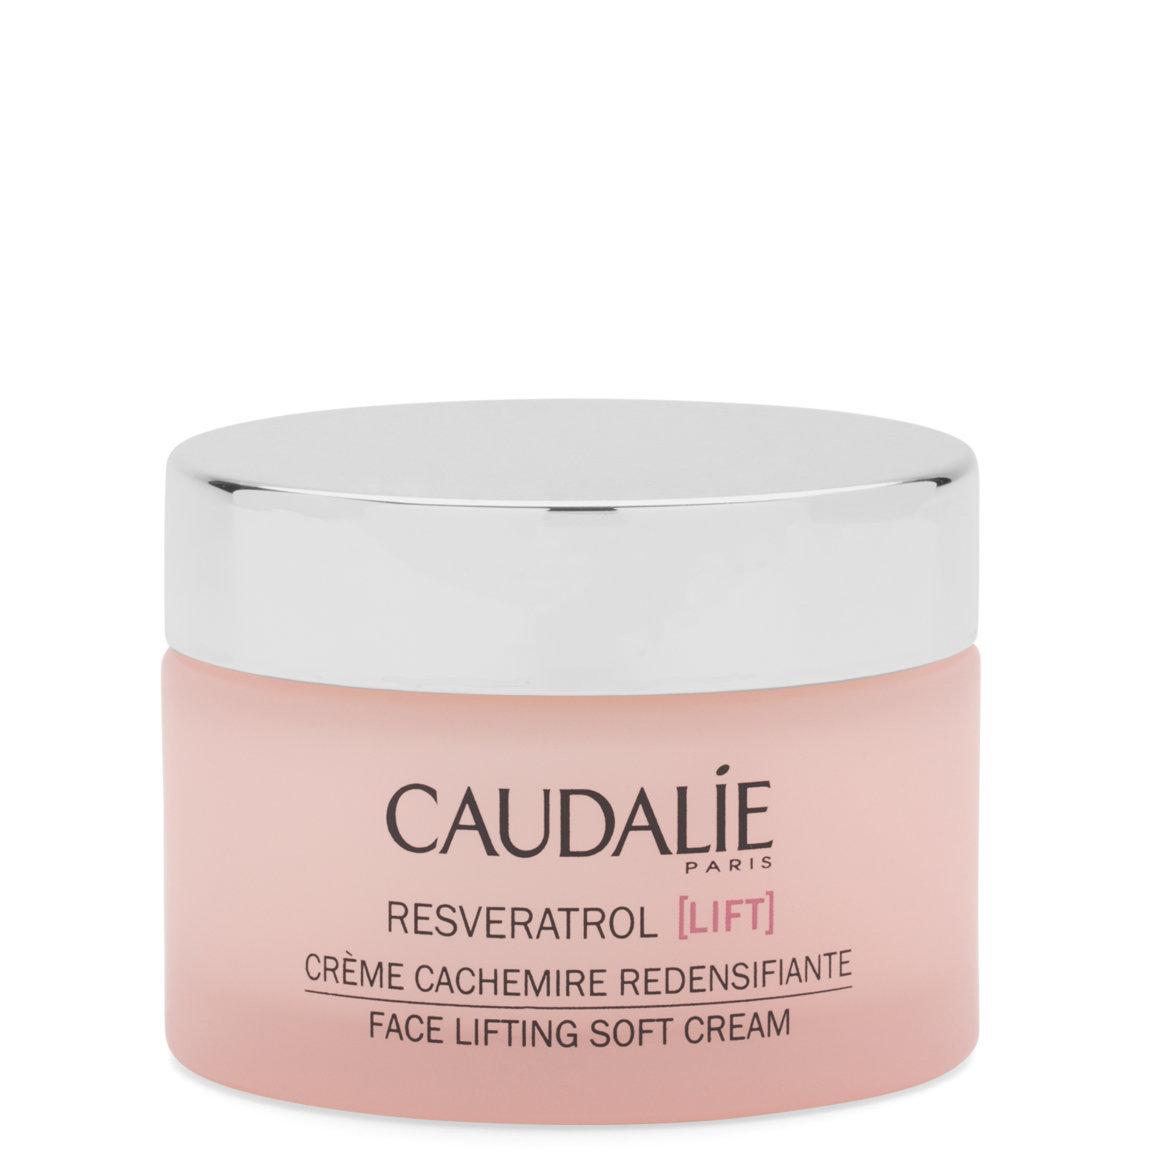 Caudalie Resveratrol [lift] Face Lifting Soft Cream product swatch.